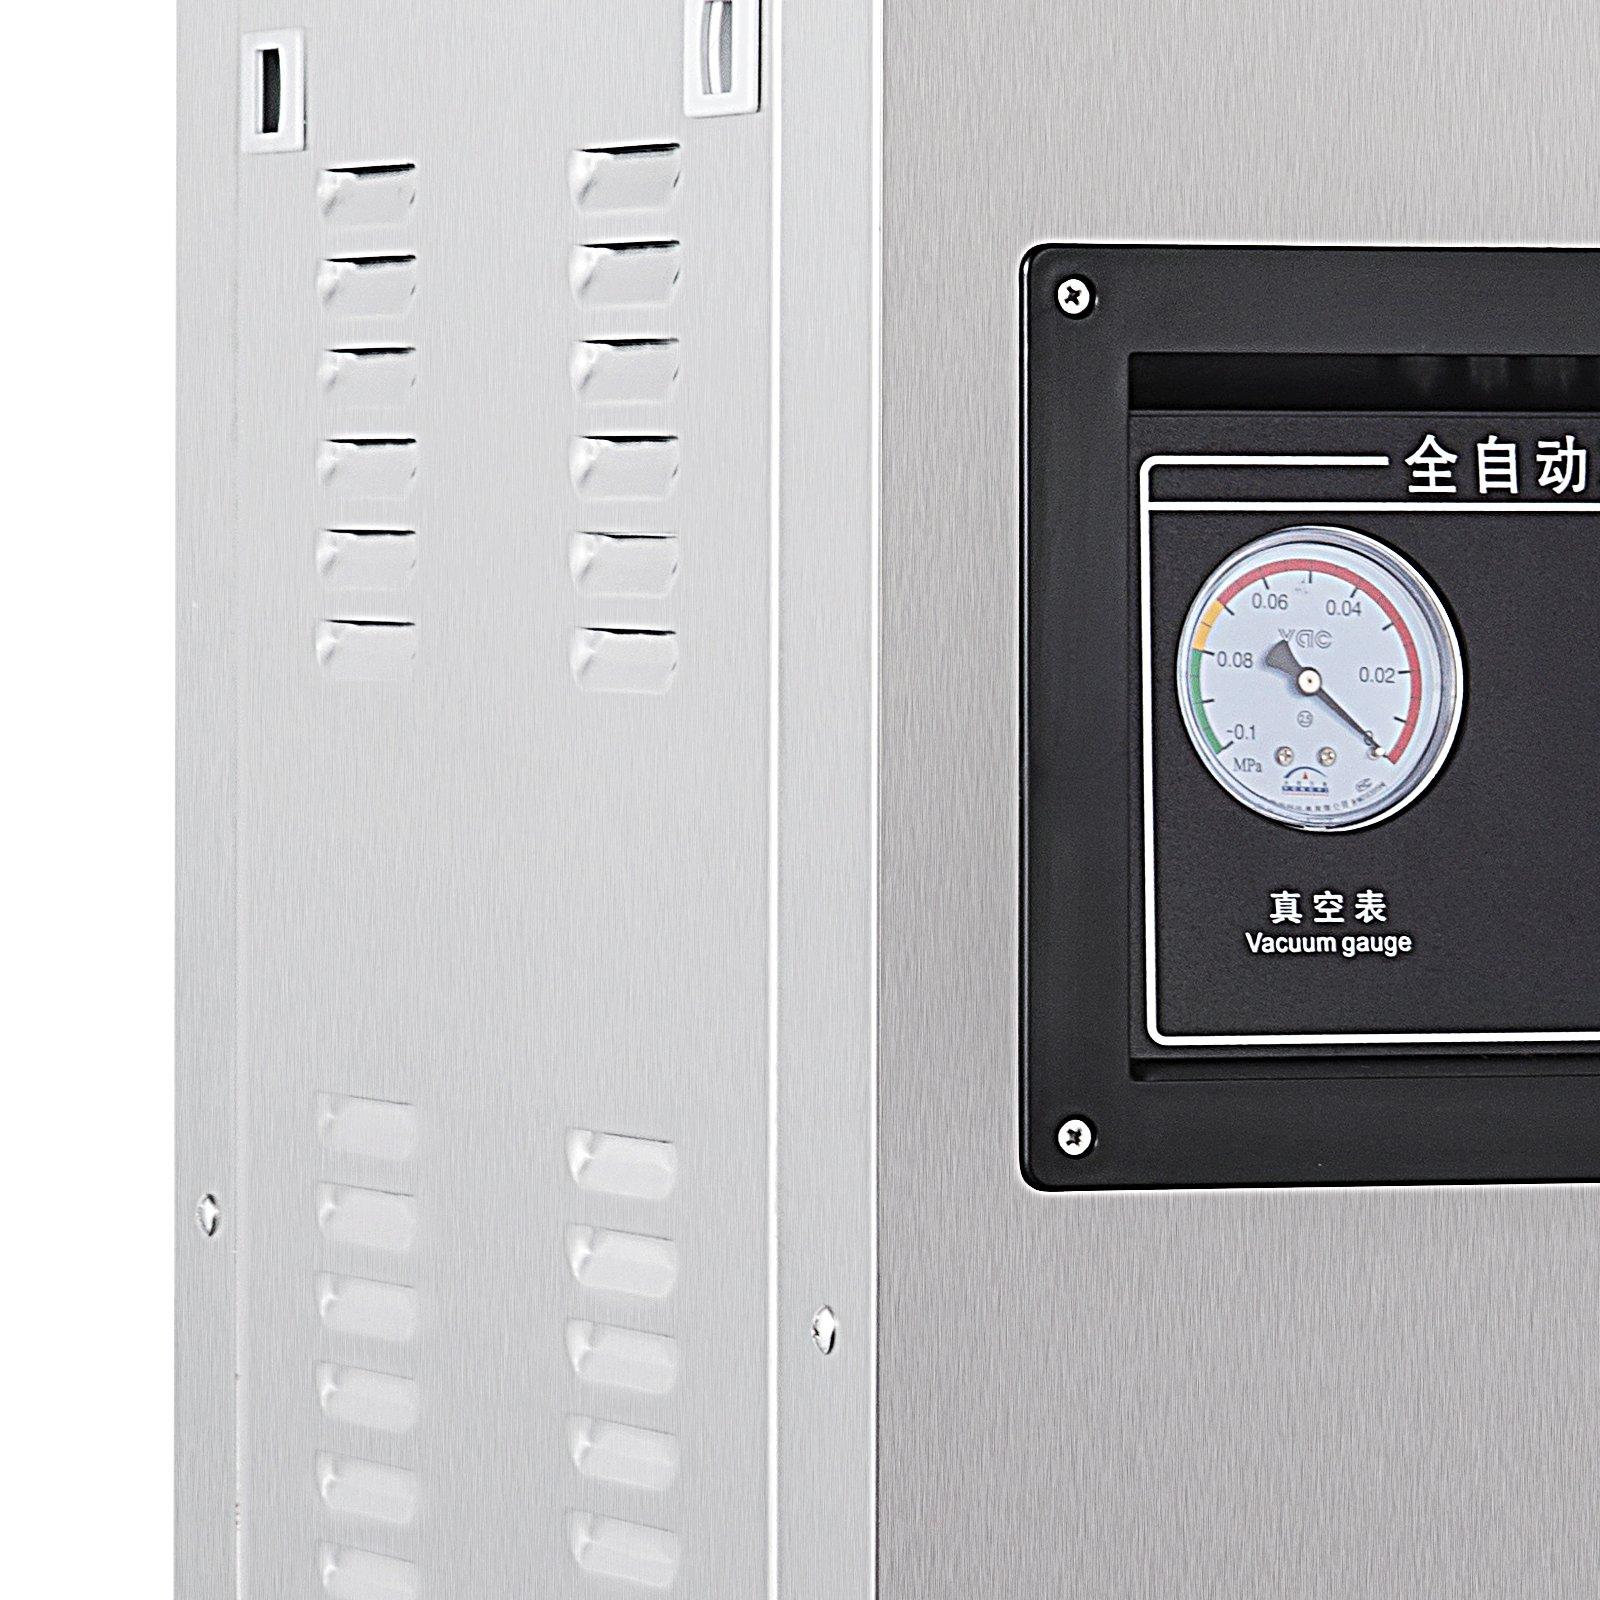 Happybuy DZ-400/2E Chamber Vacuum Sealer 1000W Vacuum Sealer Machine Automatic Vacuum Packing Sealing Sealer Machine for Home or Commercial Use (DZ-400/2E) by Happybuy (Image #7)